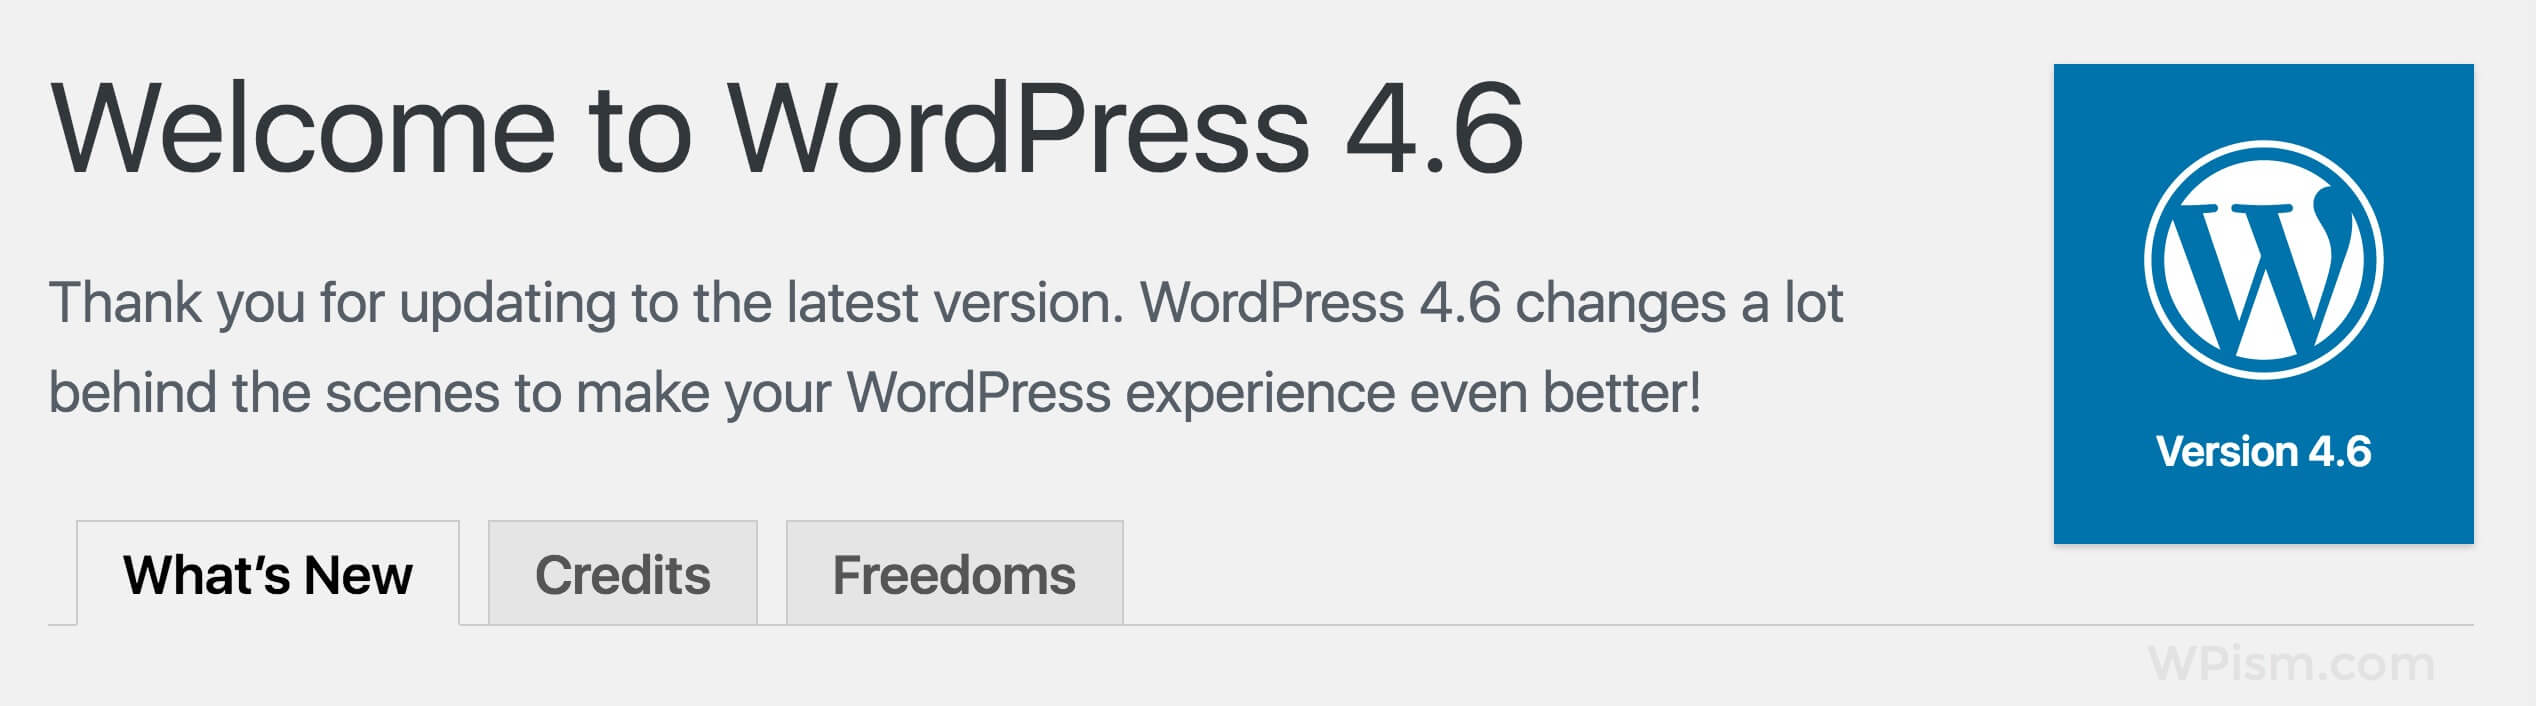 Welcome to WordPress 4.6 Screenshot